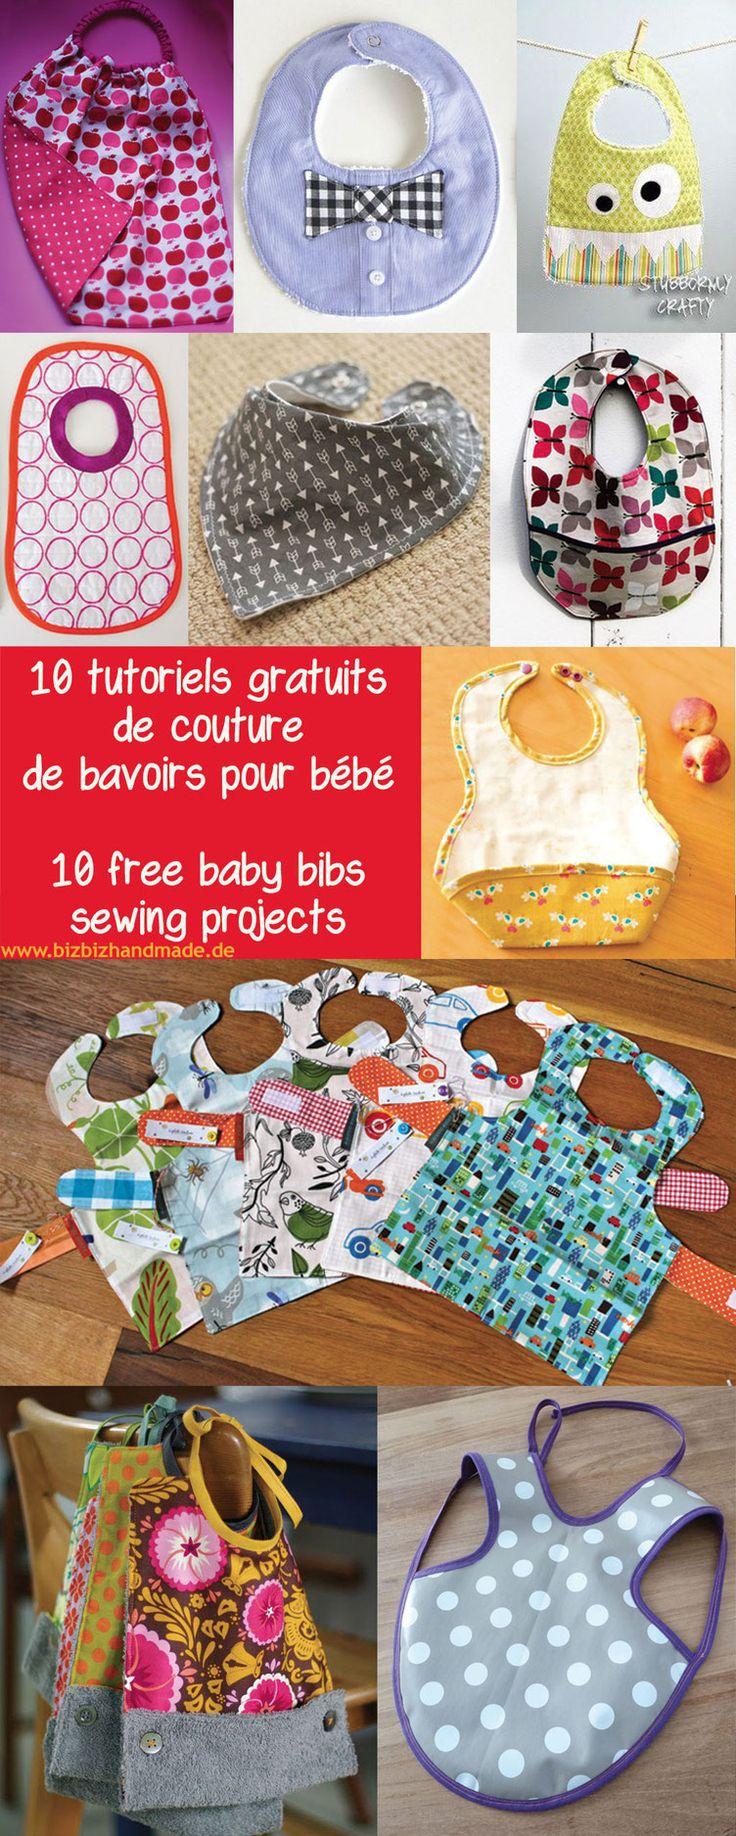 10 tutoriels gratuits de couture de bavoirs - 10 free baby bibs sewing projects - DIY - Tutorial  by BizBizHandmade -   couture · tuto · tutoriel · patron · pattern · bib ·